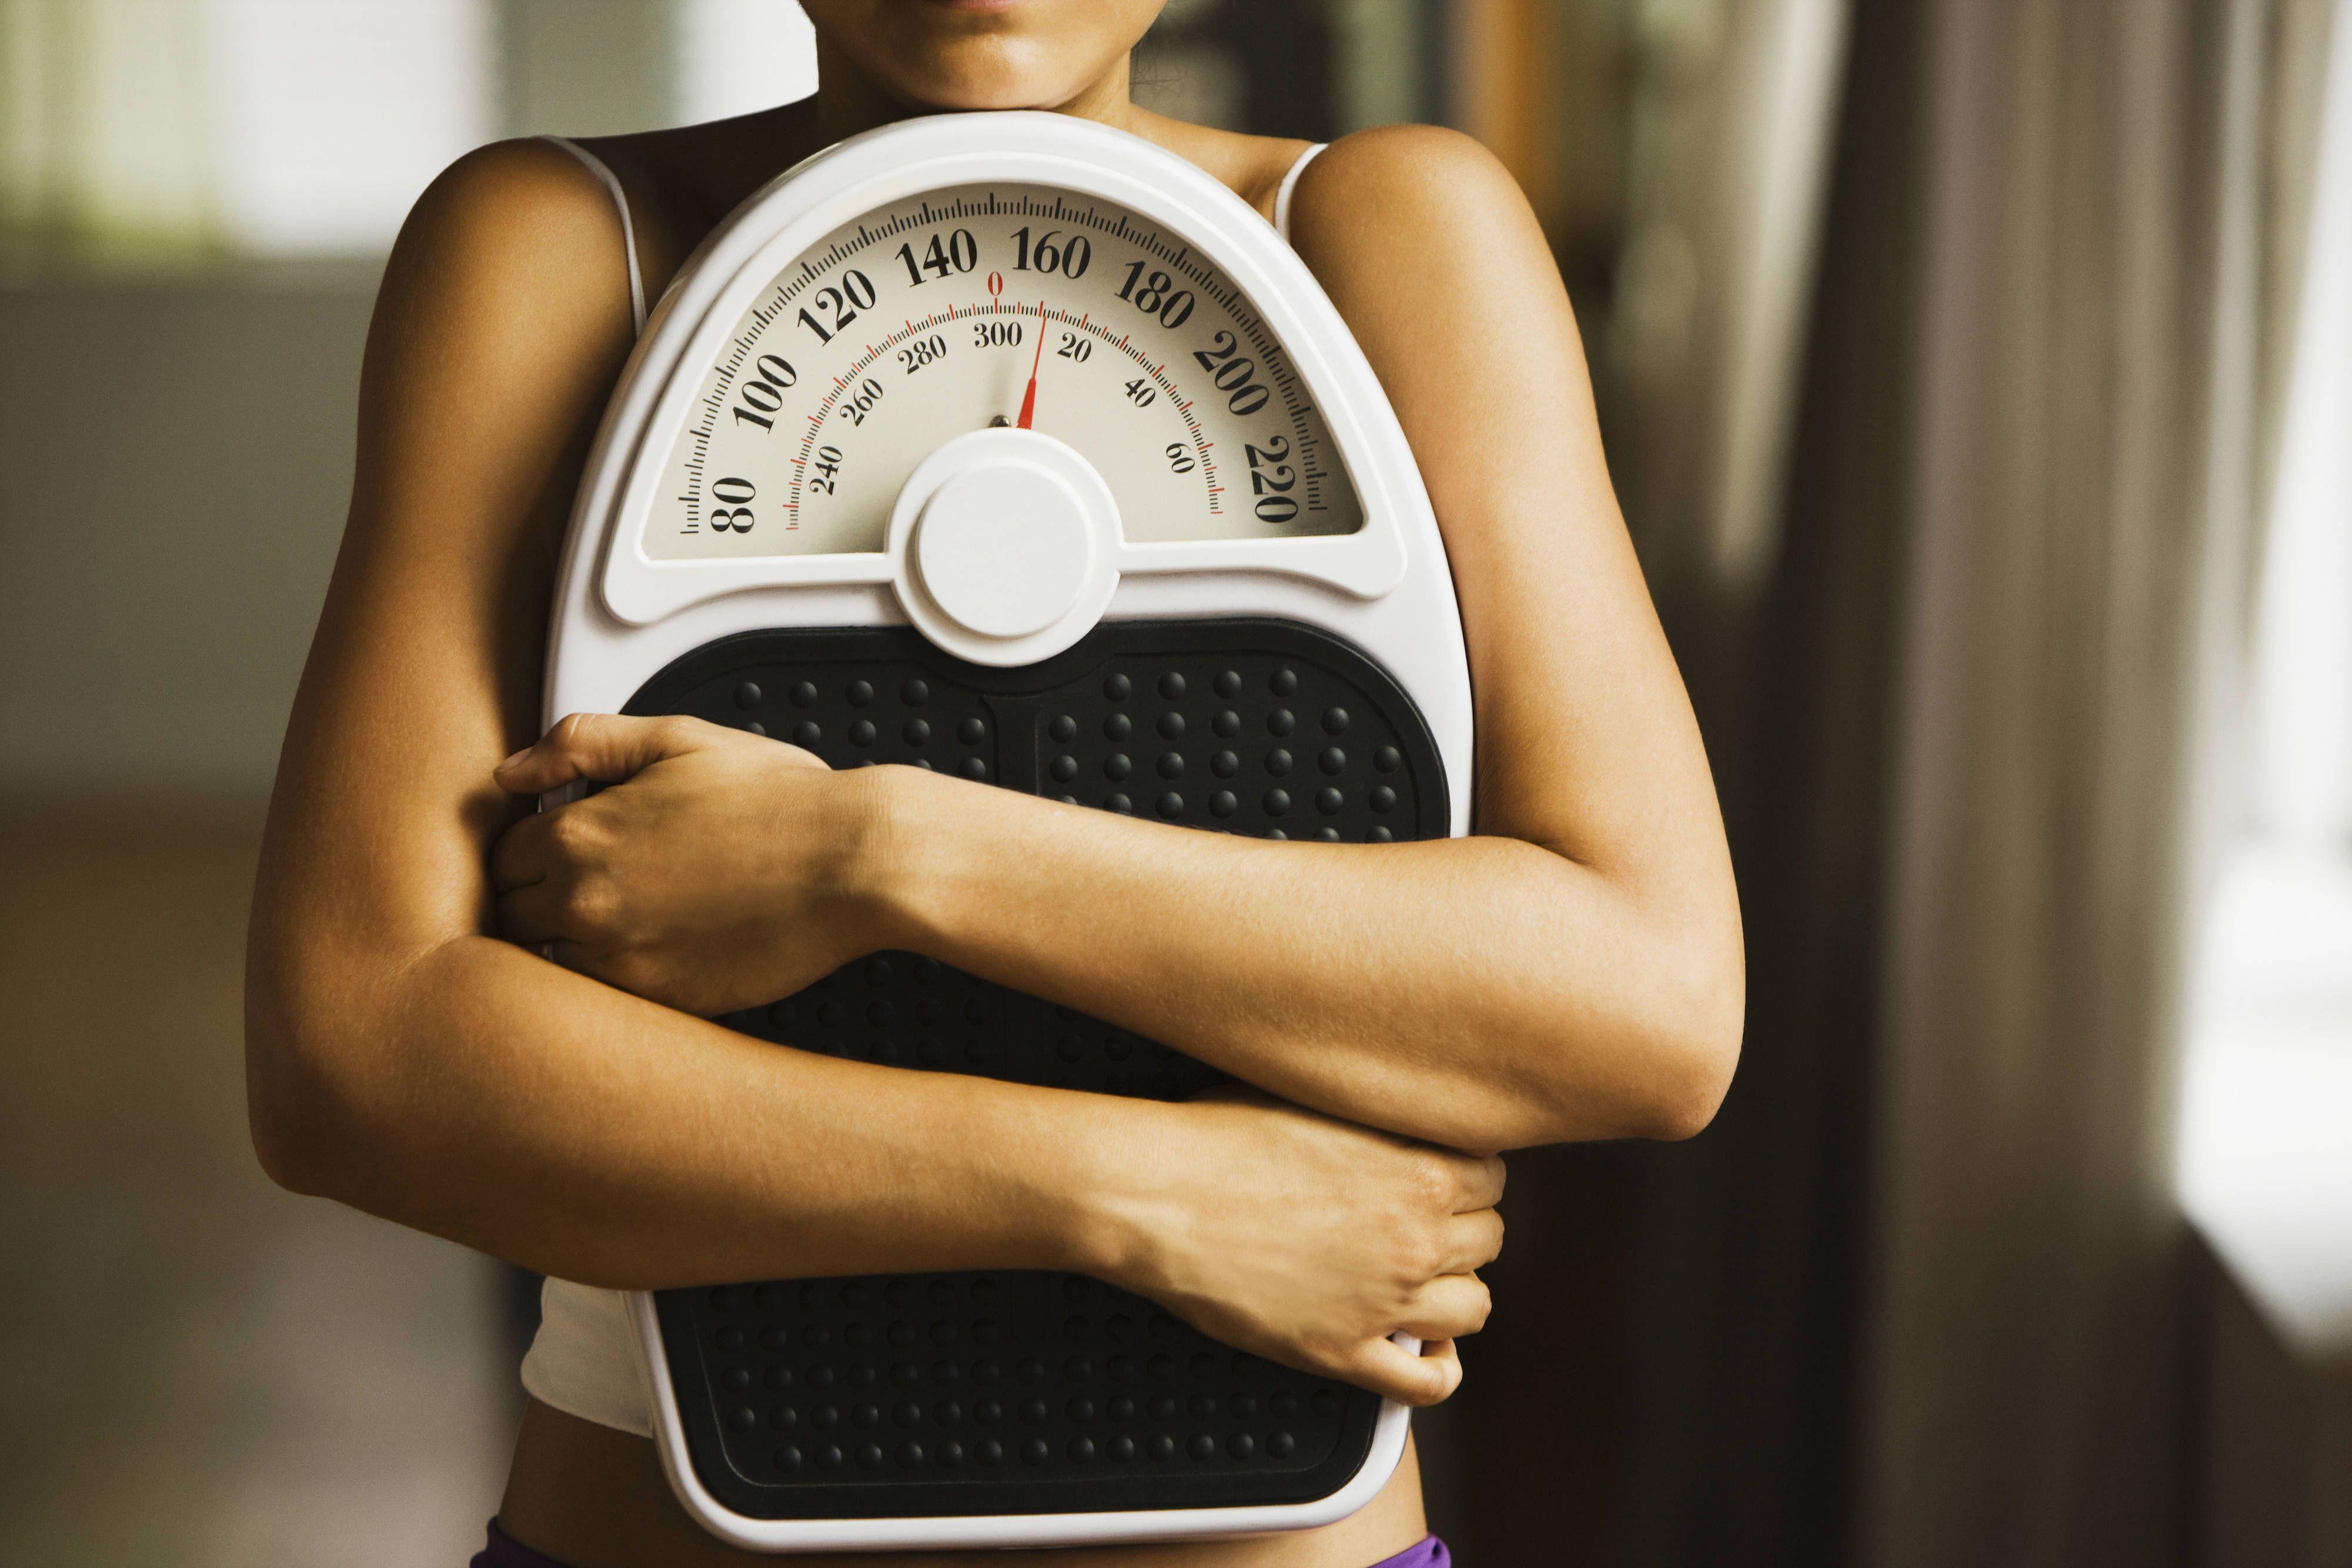 Do u lose weight when u go to the bathroom